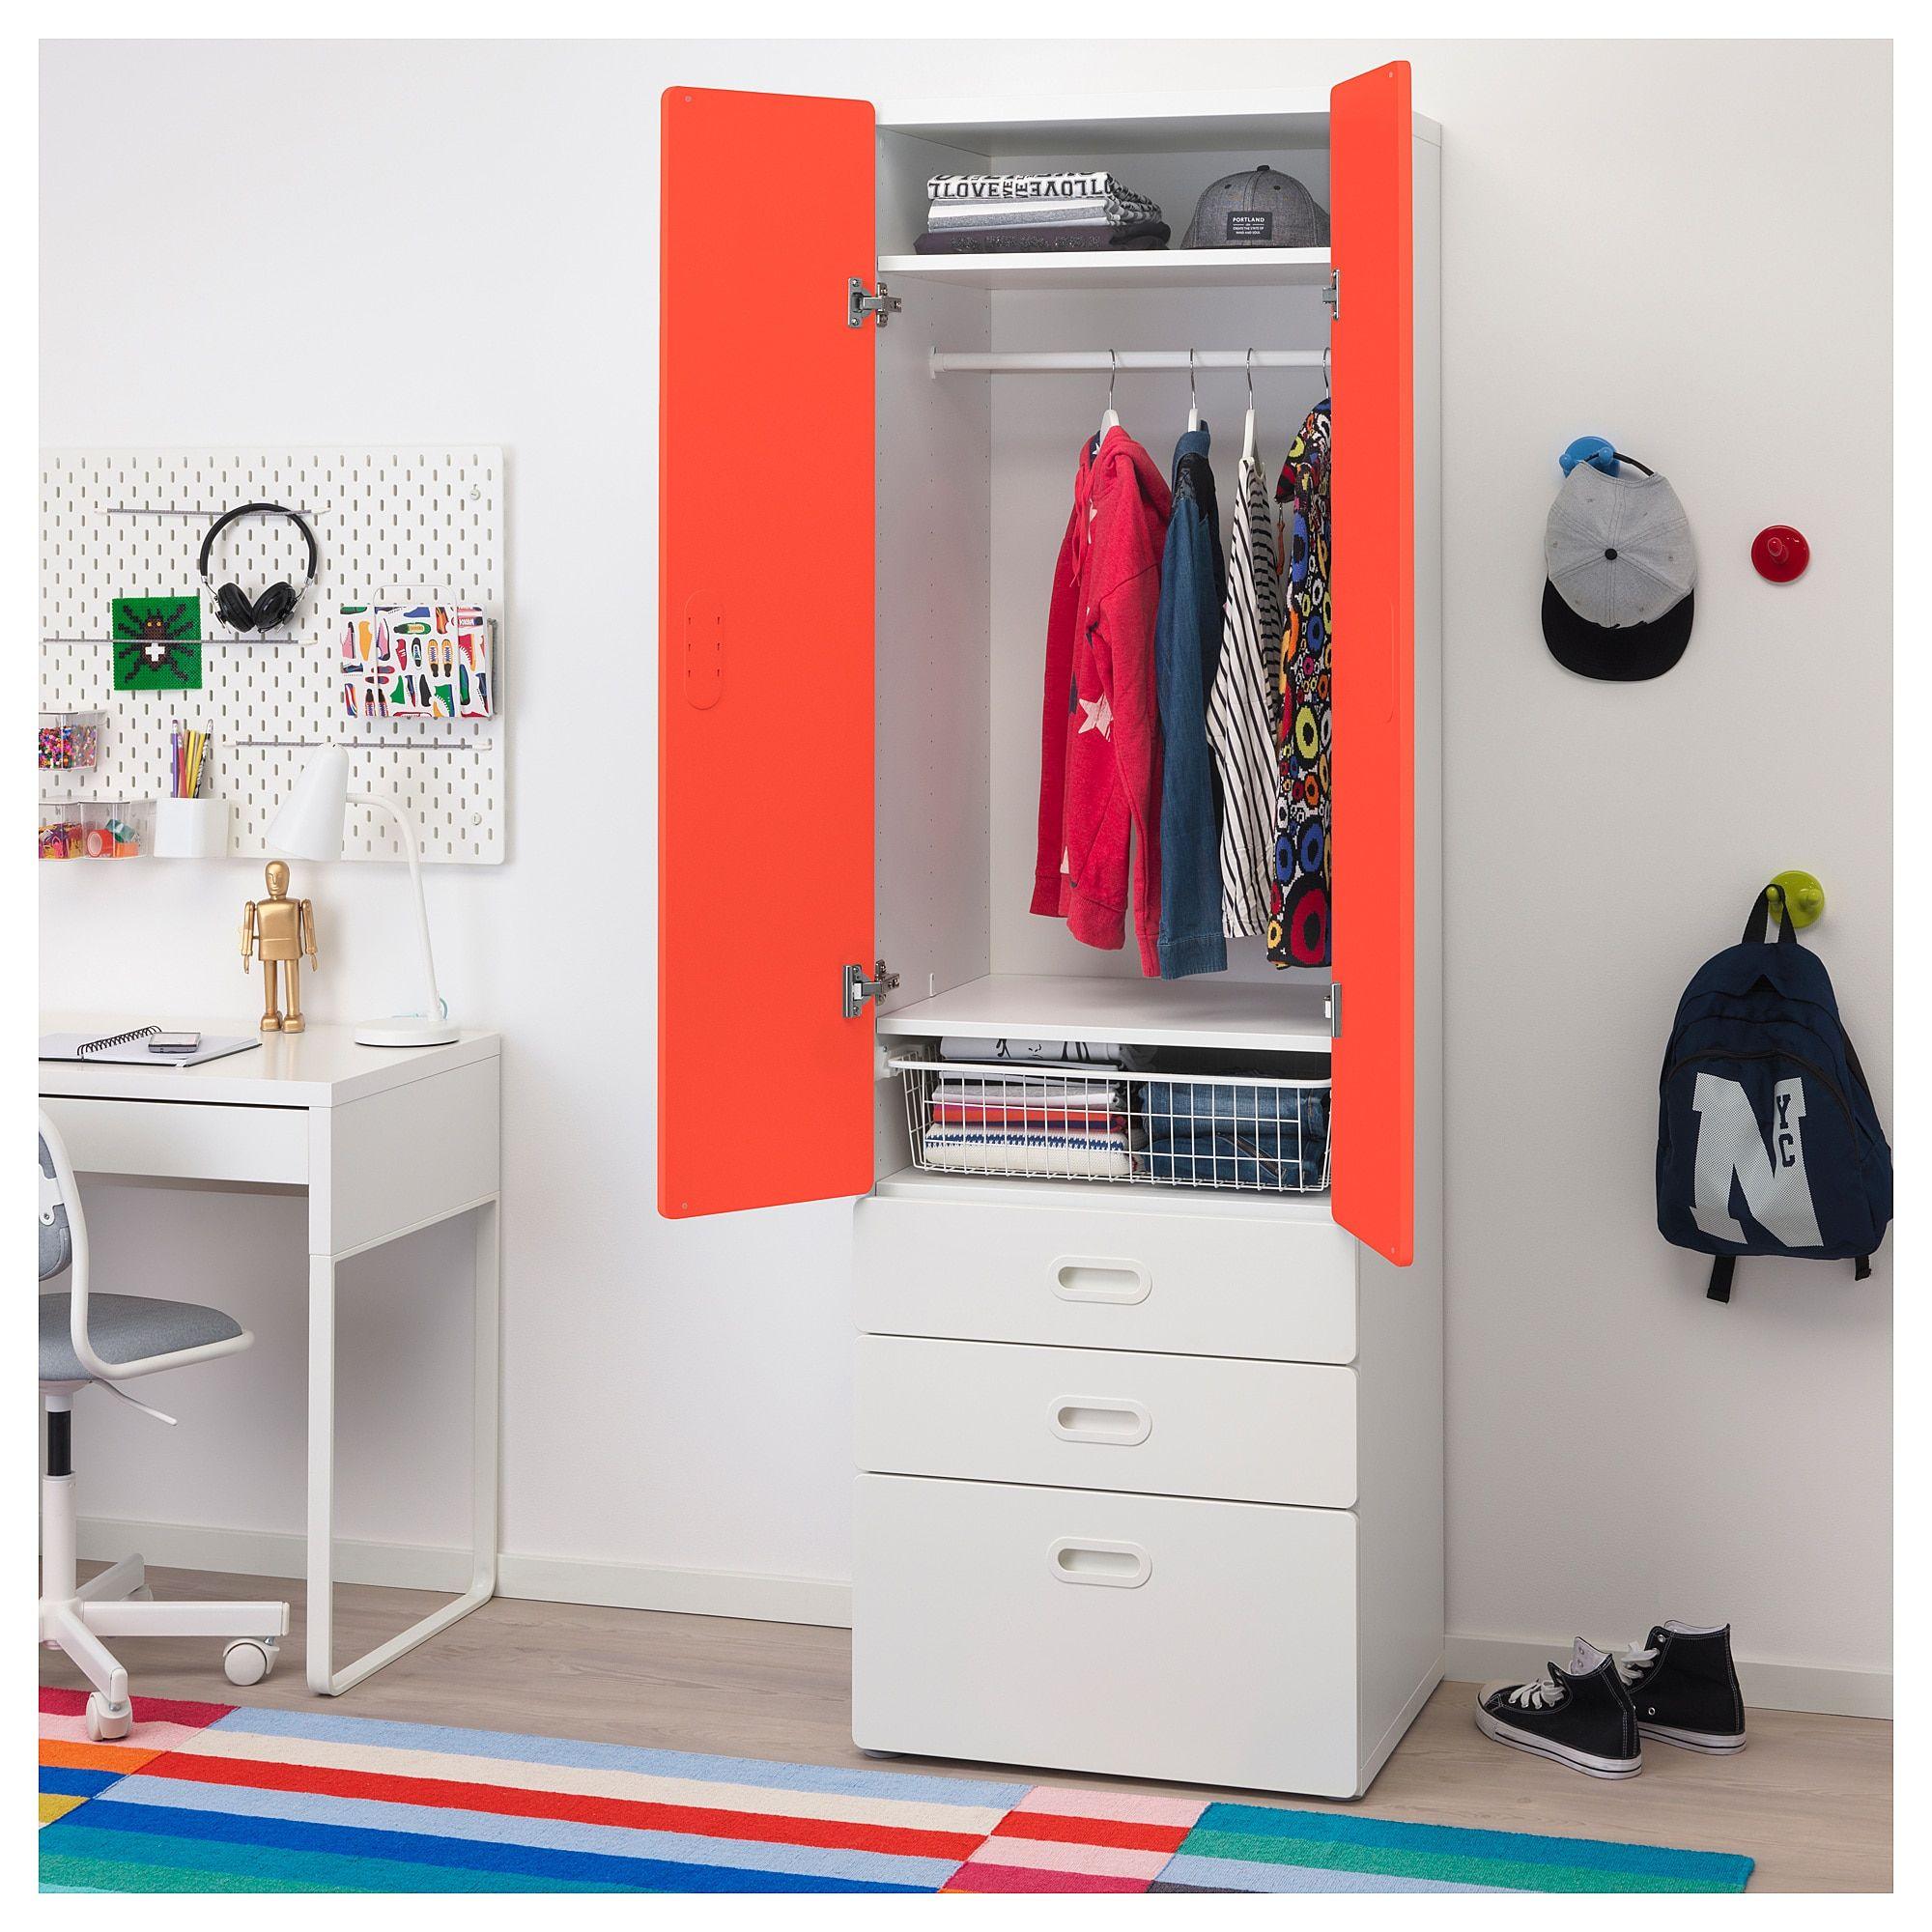 Ikea Stuva Fritids White Red Wardrobe In 2019 Ikea Closet